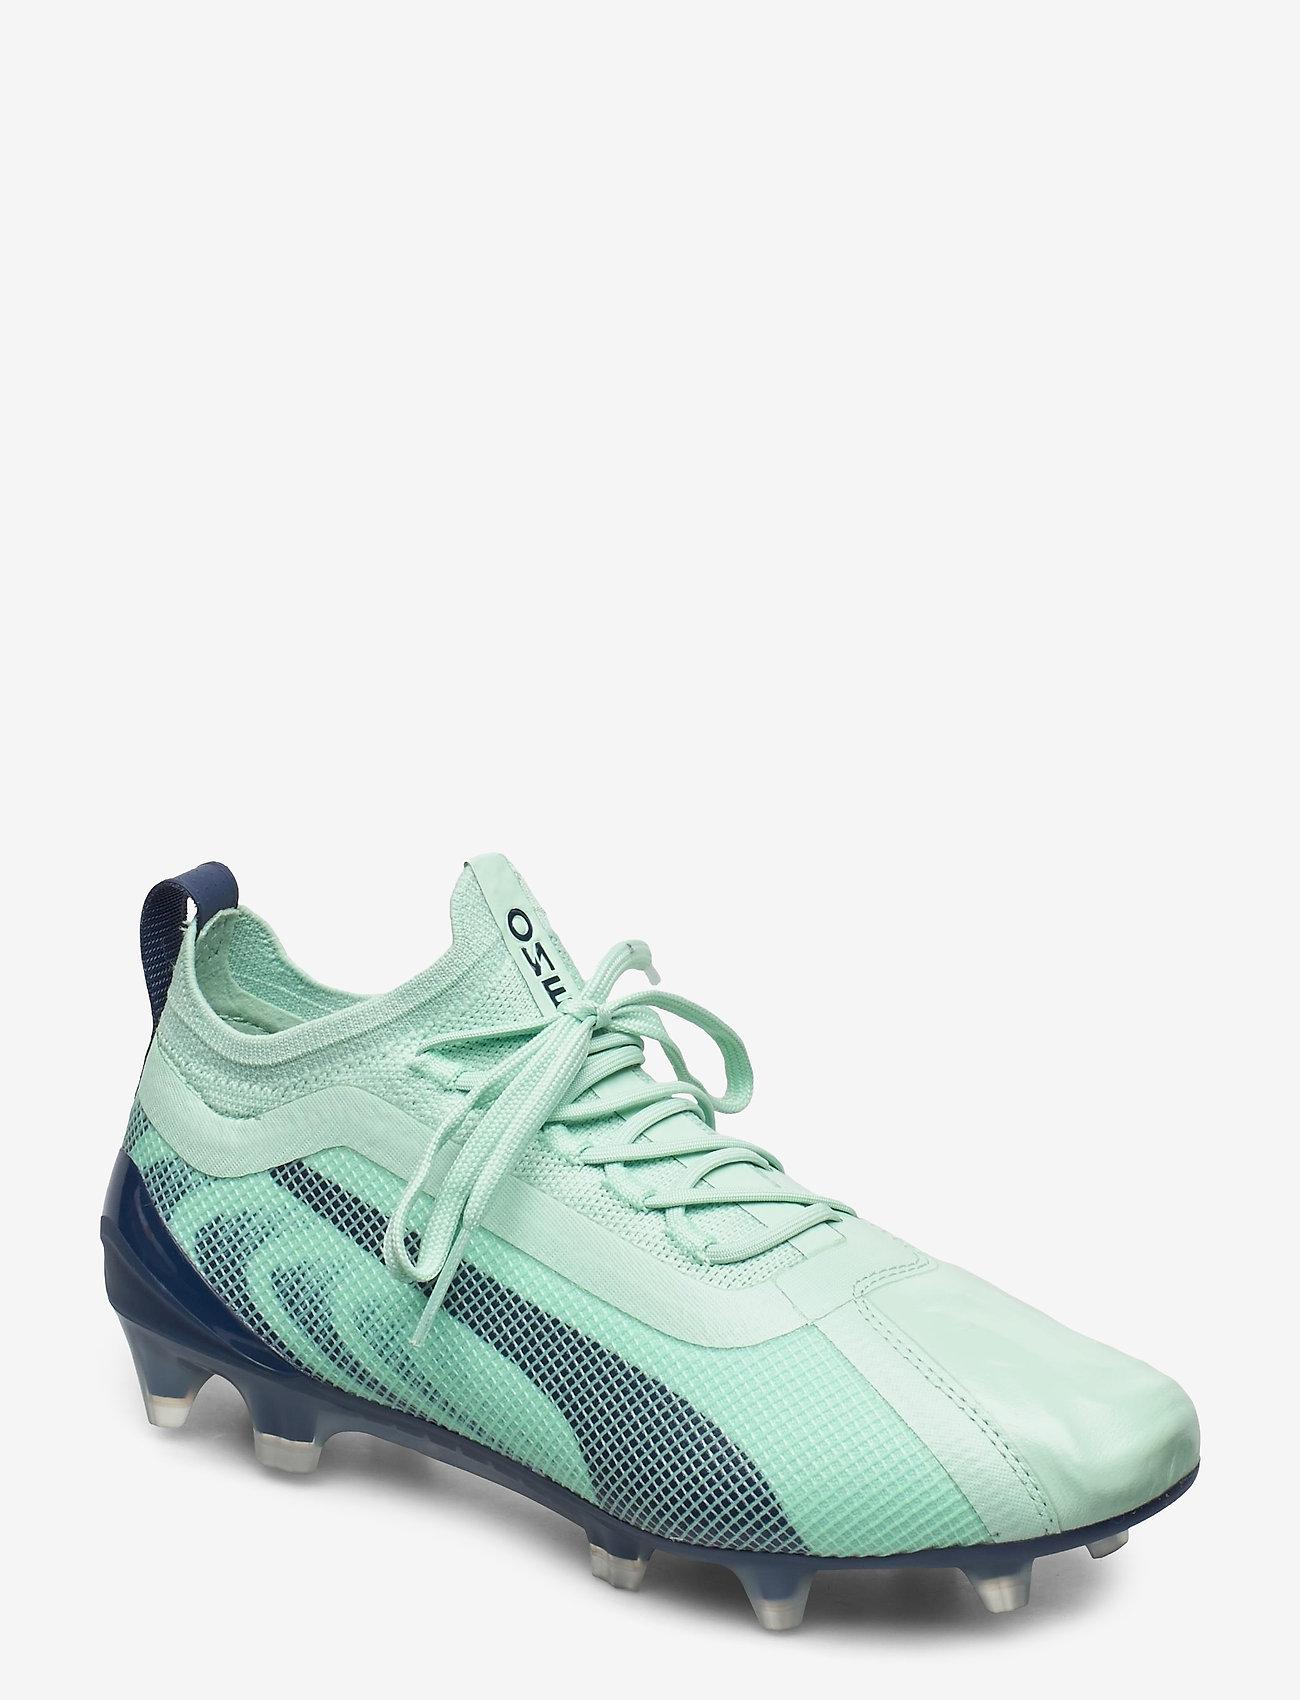 PUMA - PUMA ONE 20.1 Wms  FG/AG - fotbollsskor - mist green-high rise-dark denim - 0